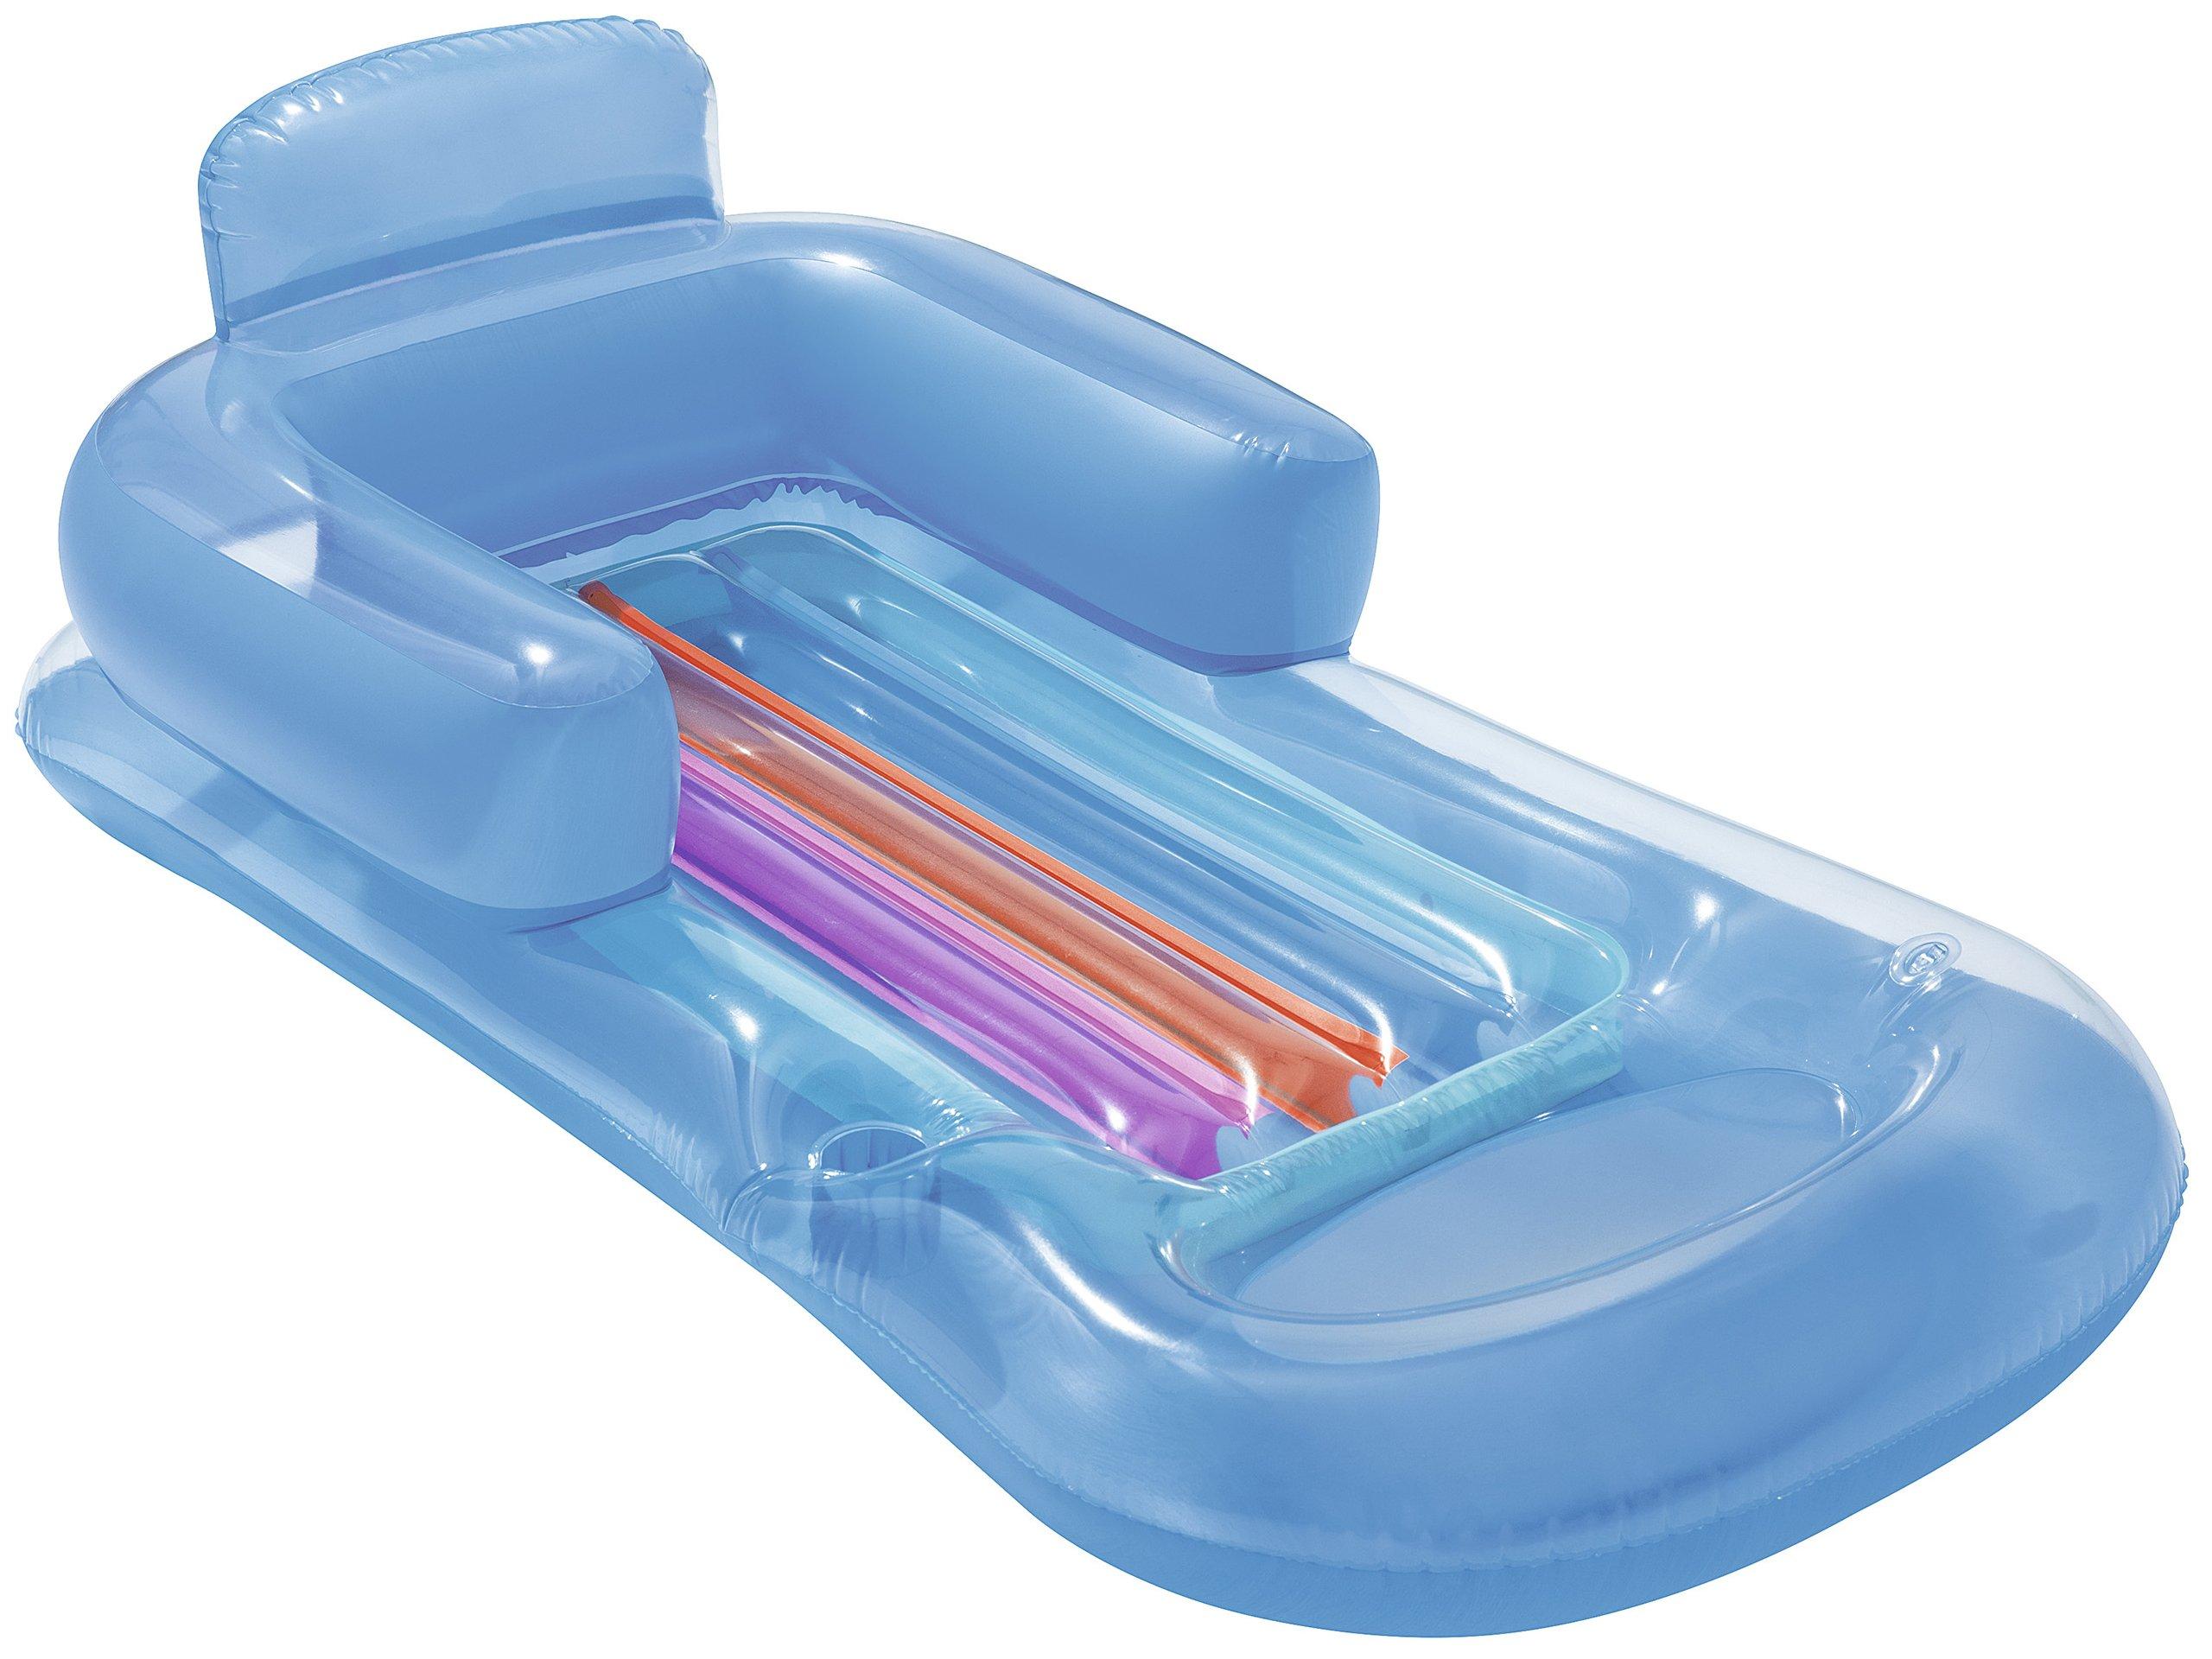 54a07a1117ad2a materac do pływania BESTWAY fotel z oparciem 161cm - 7226437462 ...